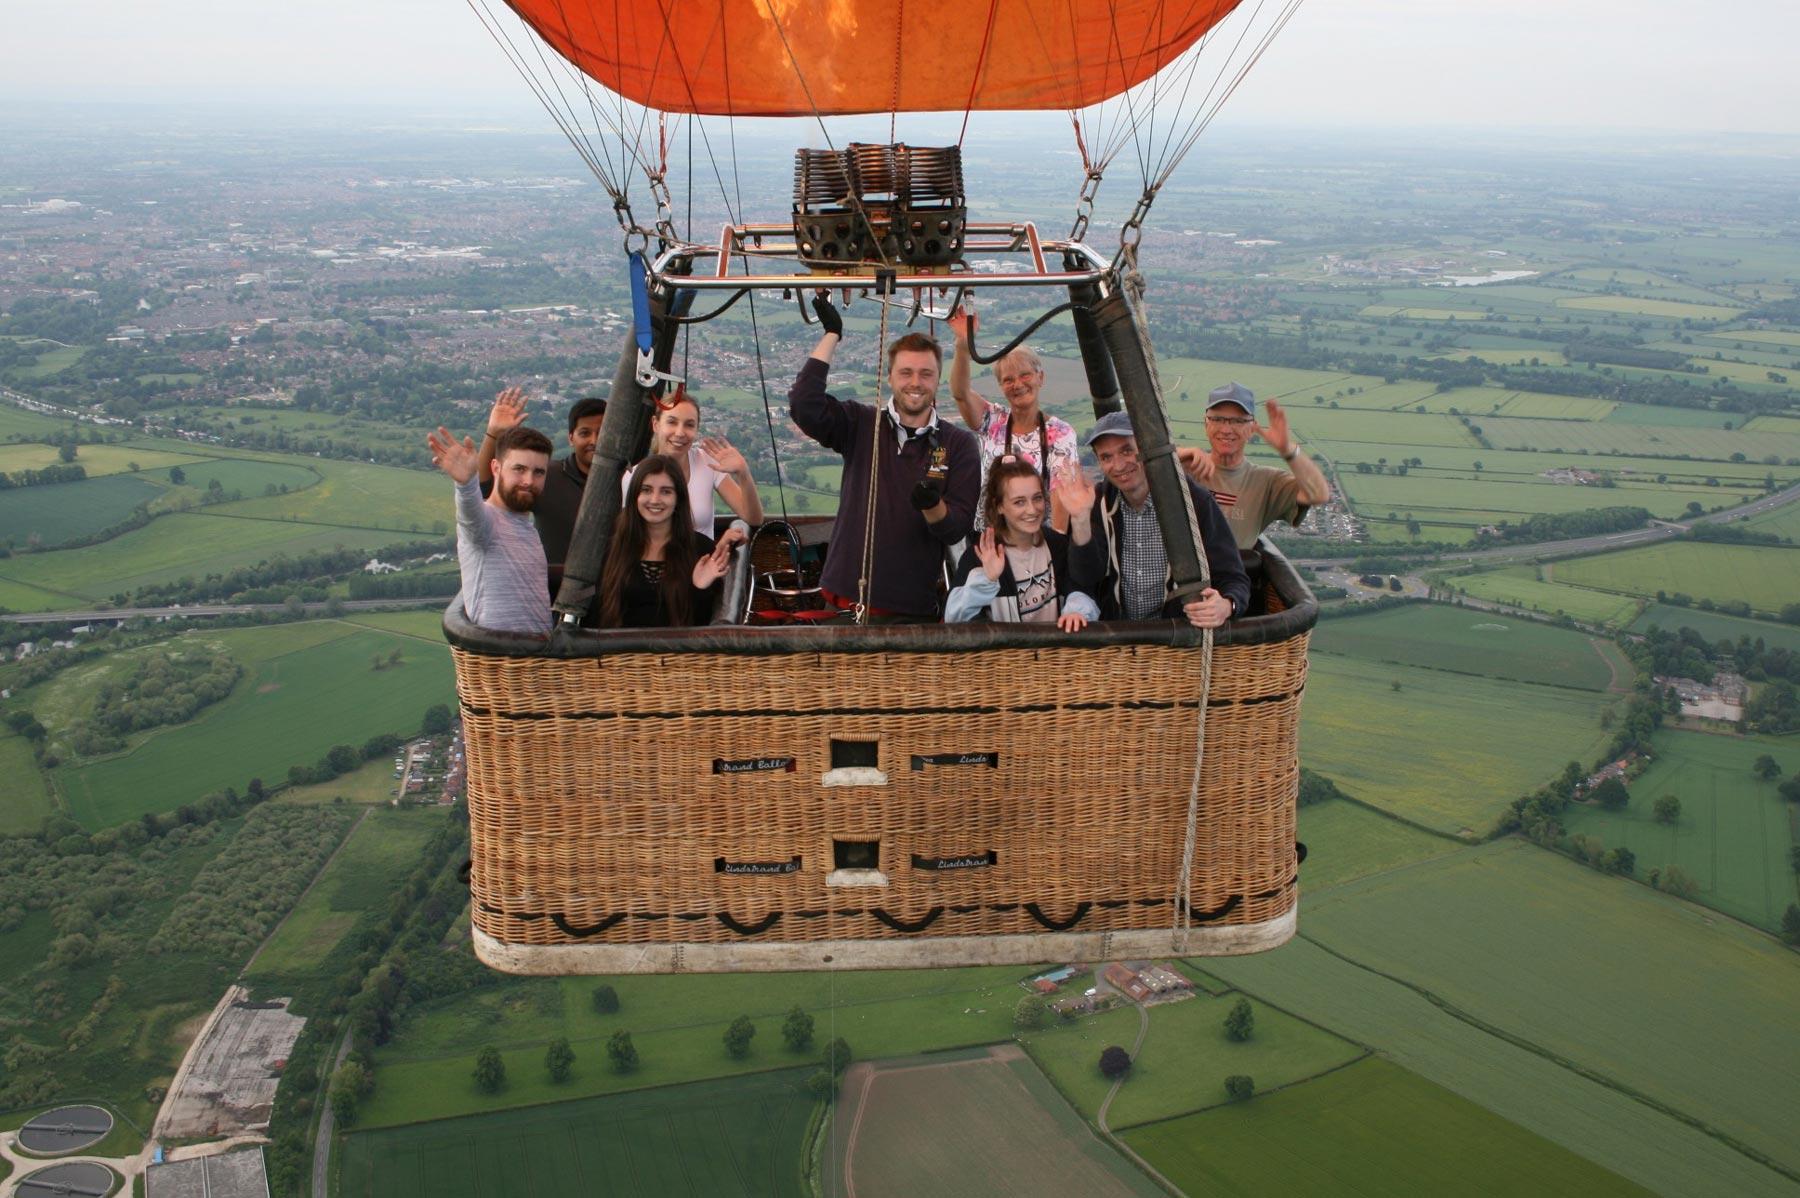 Yorkshire Balloon Flights Crew and Passengers